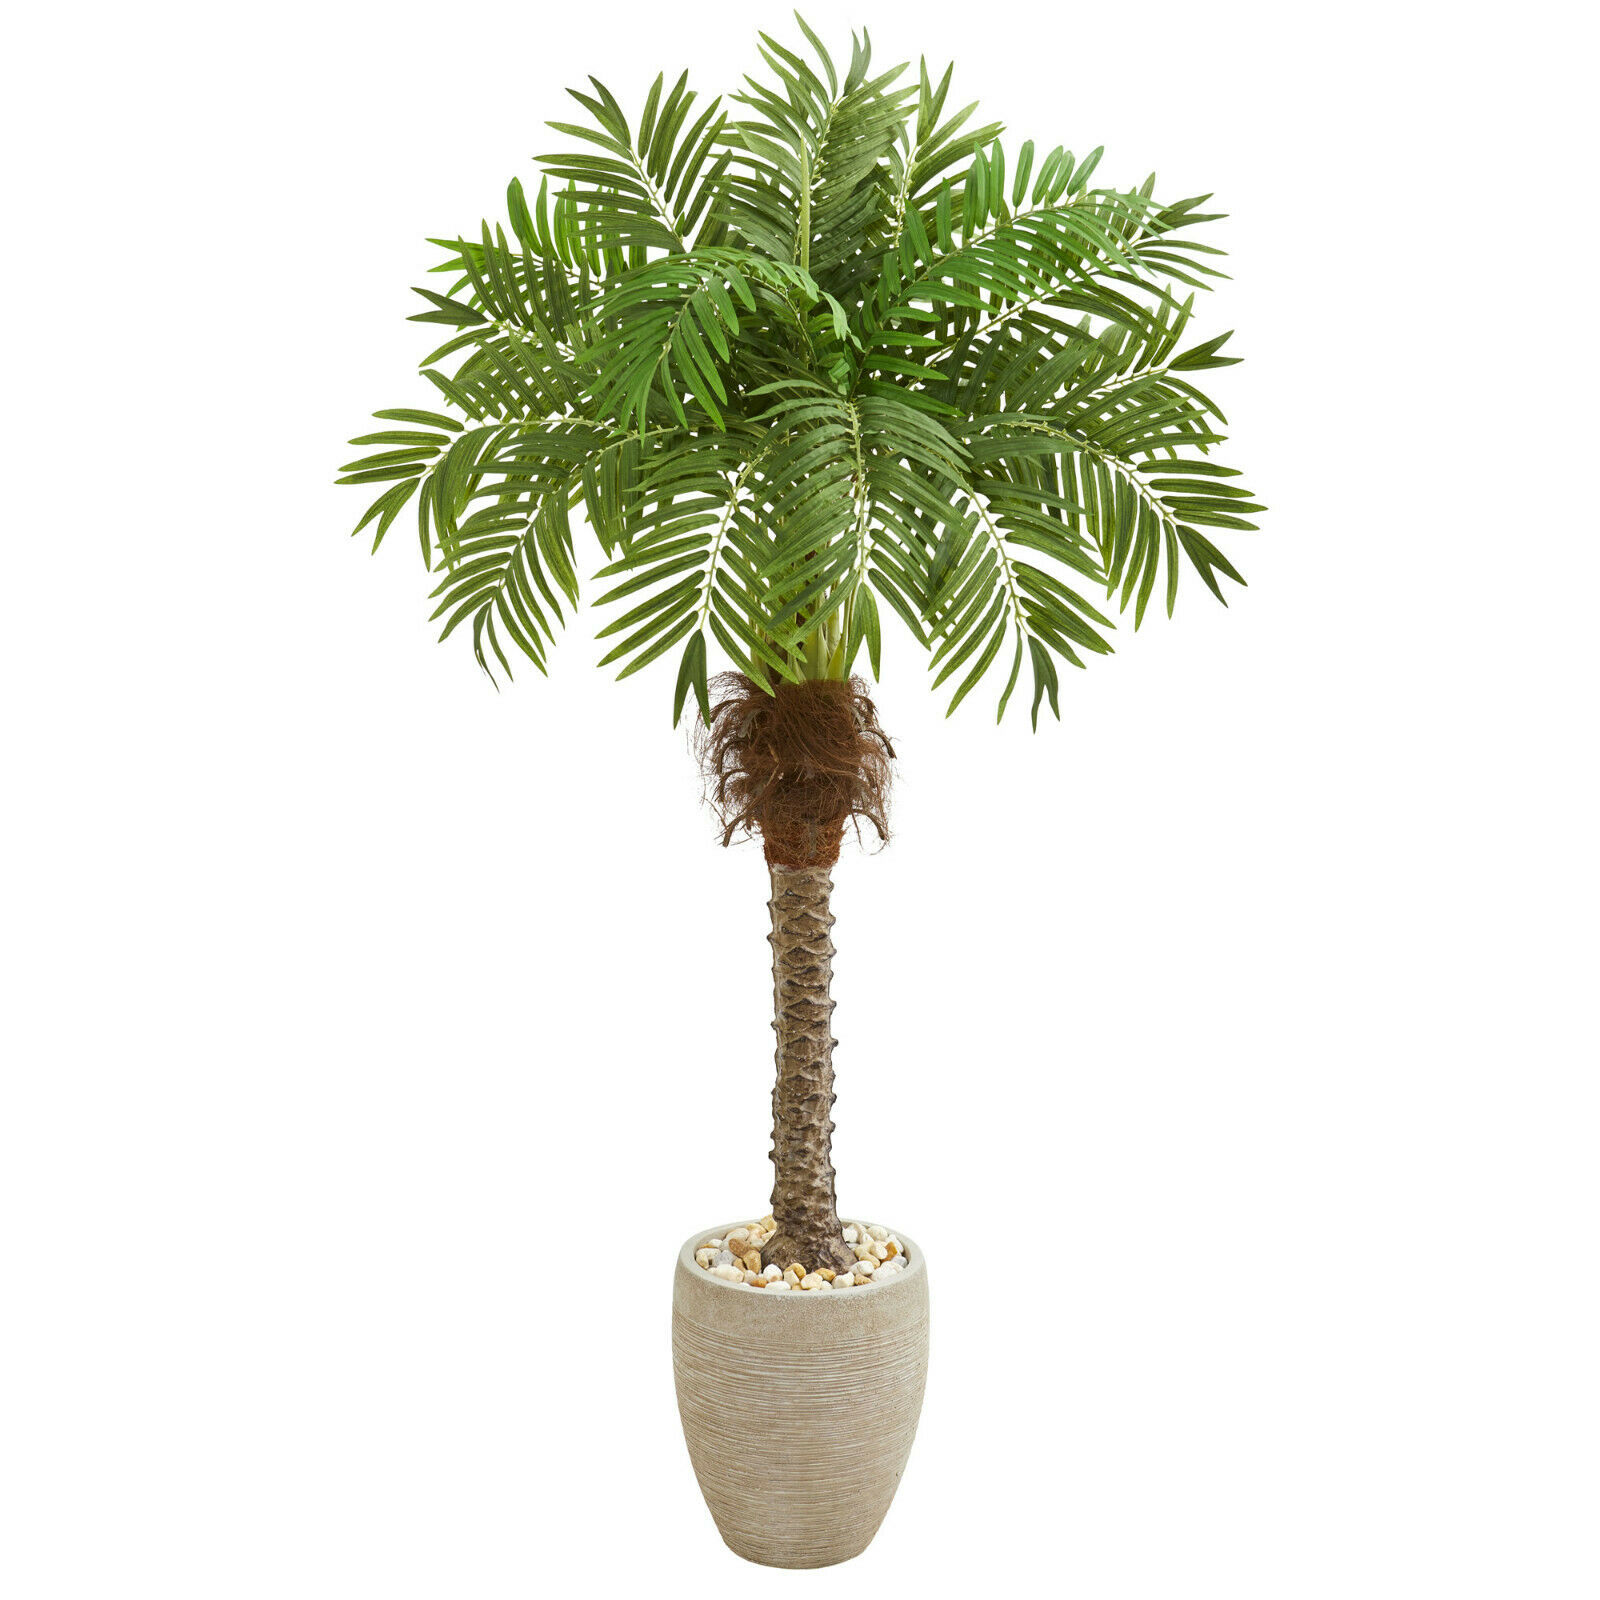 "63"" Great Robellini Palm' Artificial Silk Tree in Weiß Sandstone Planter"